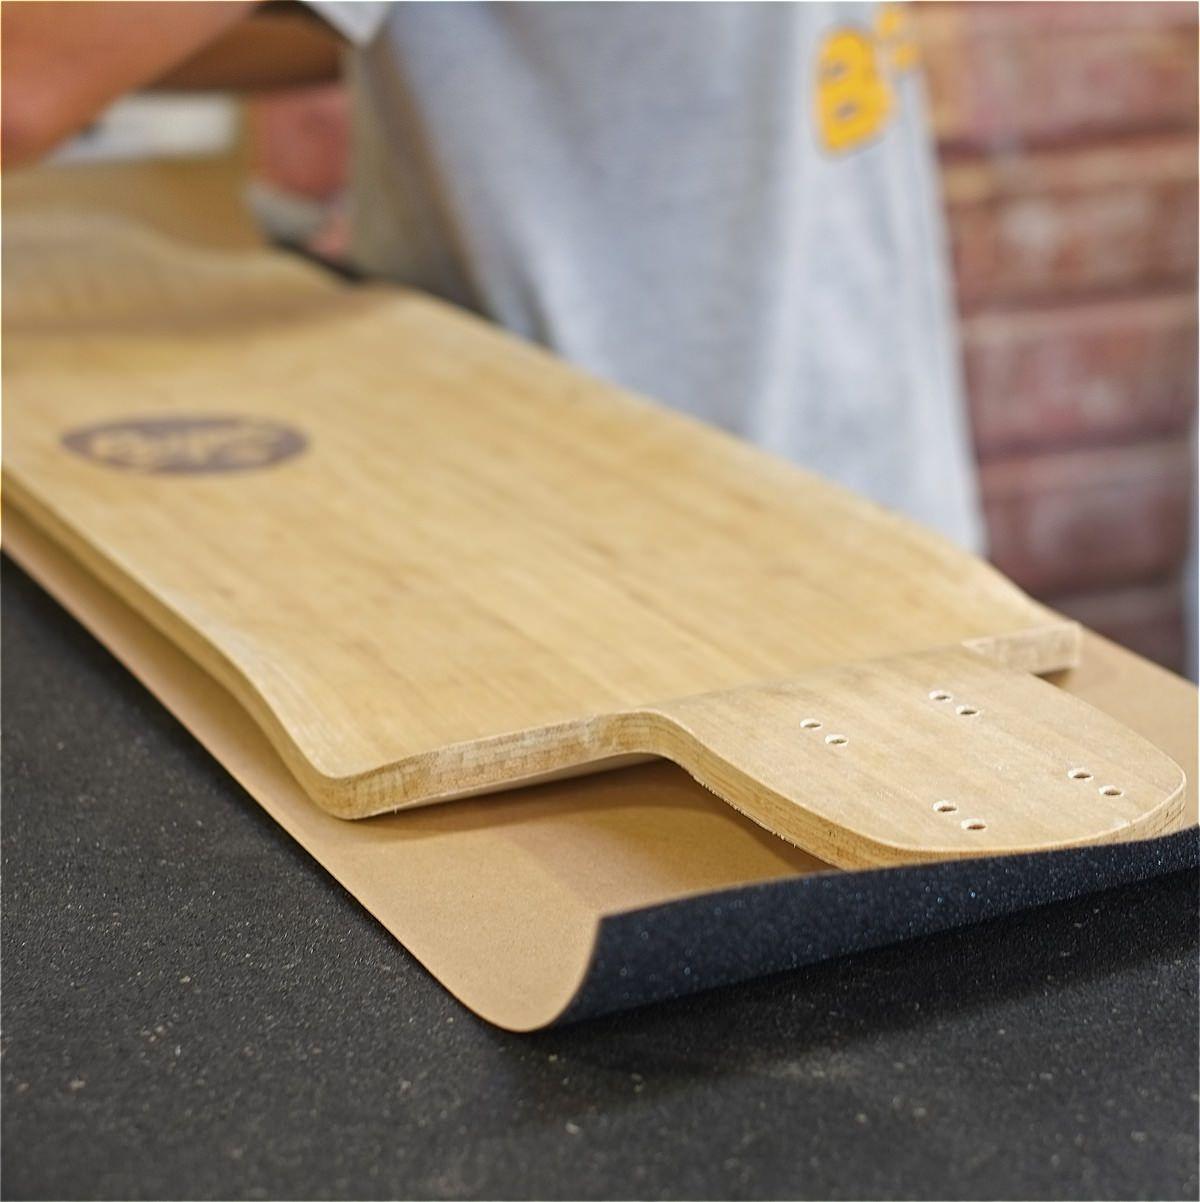 Diy How To Apply Grip Tape Skateboard Grip Tape Grip